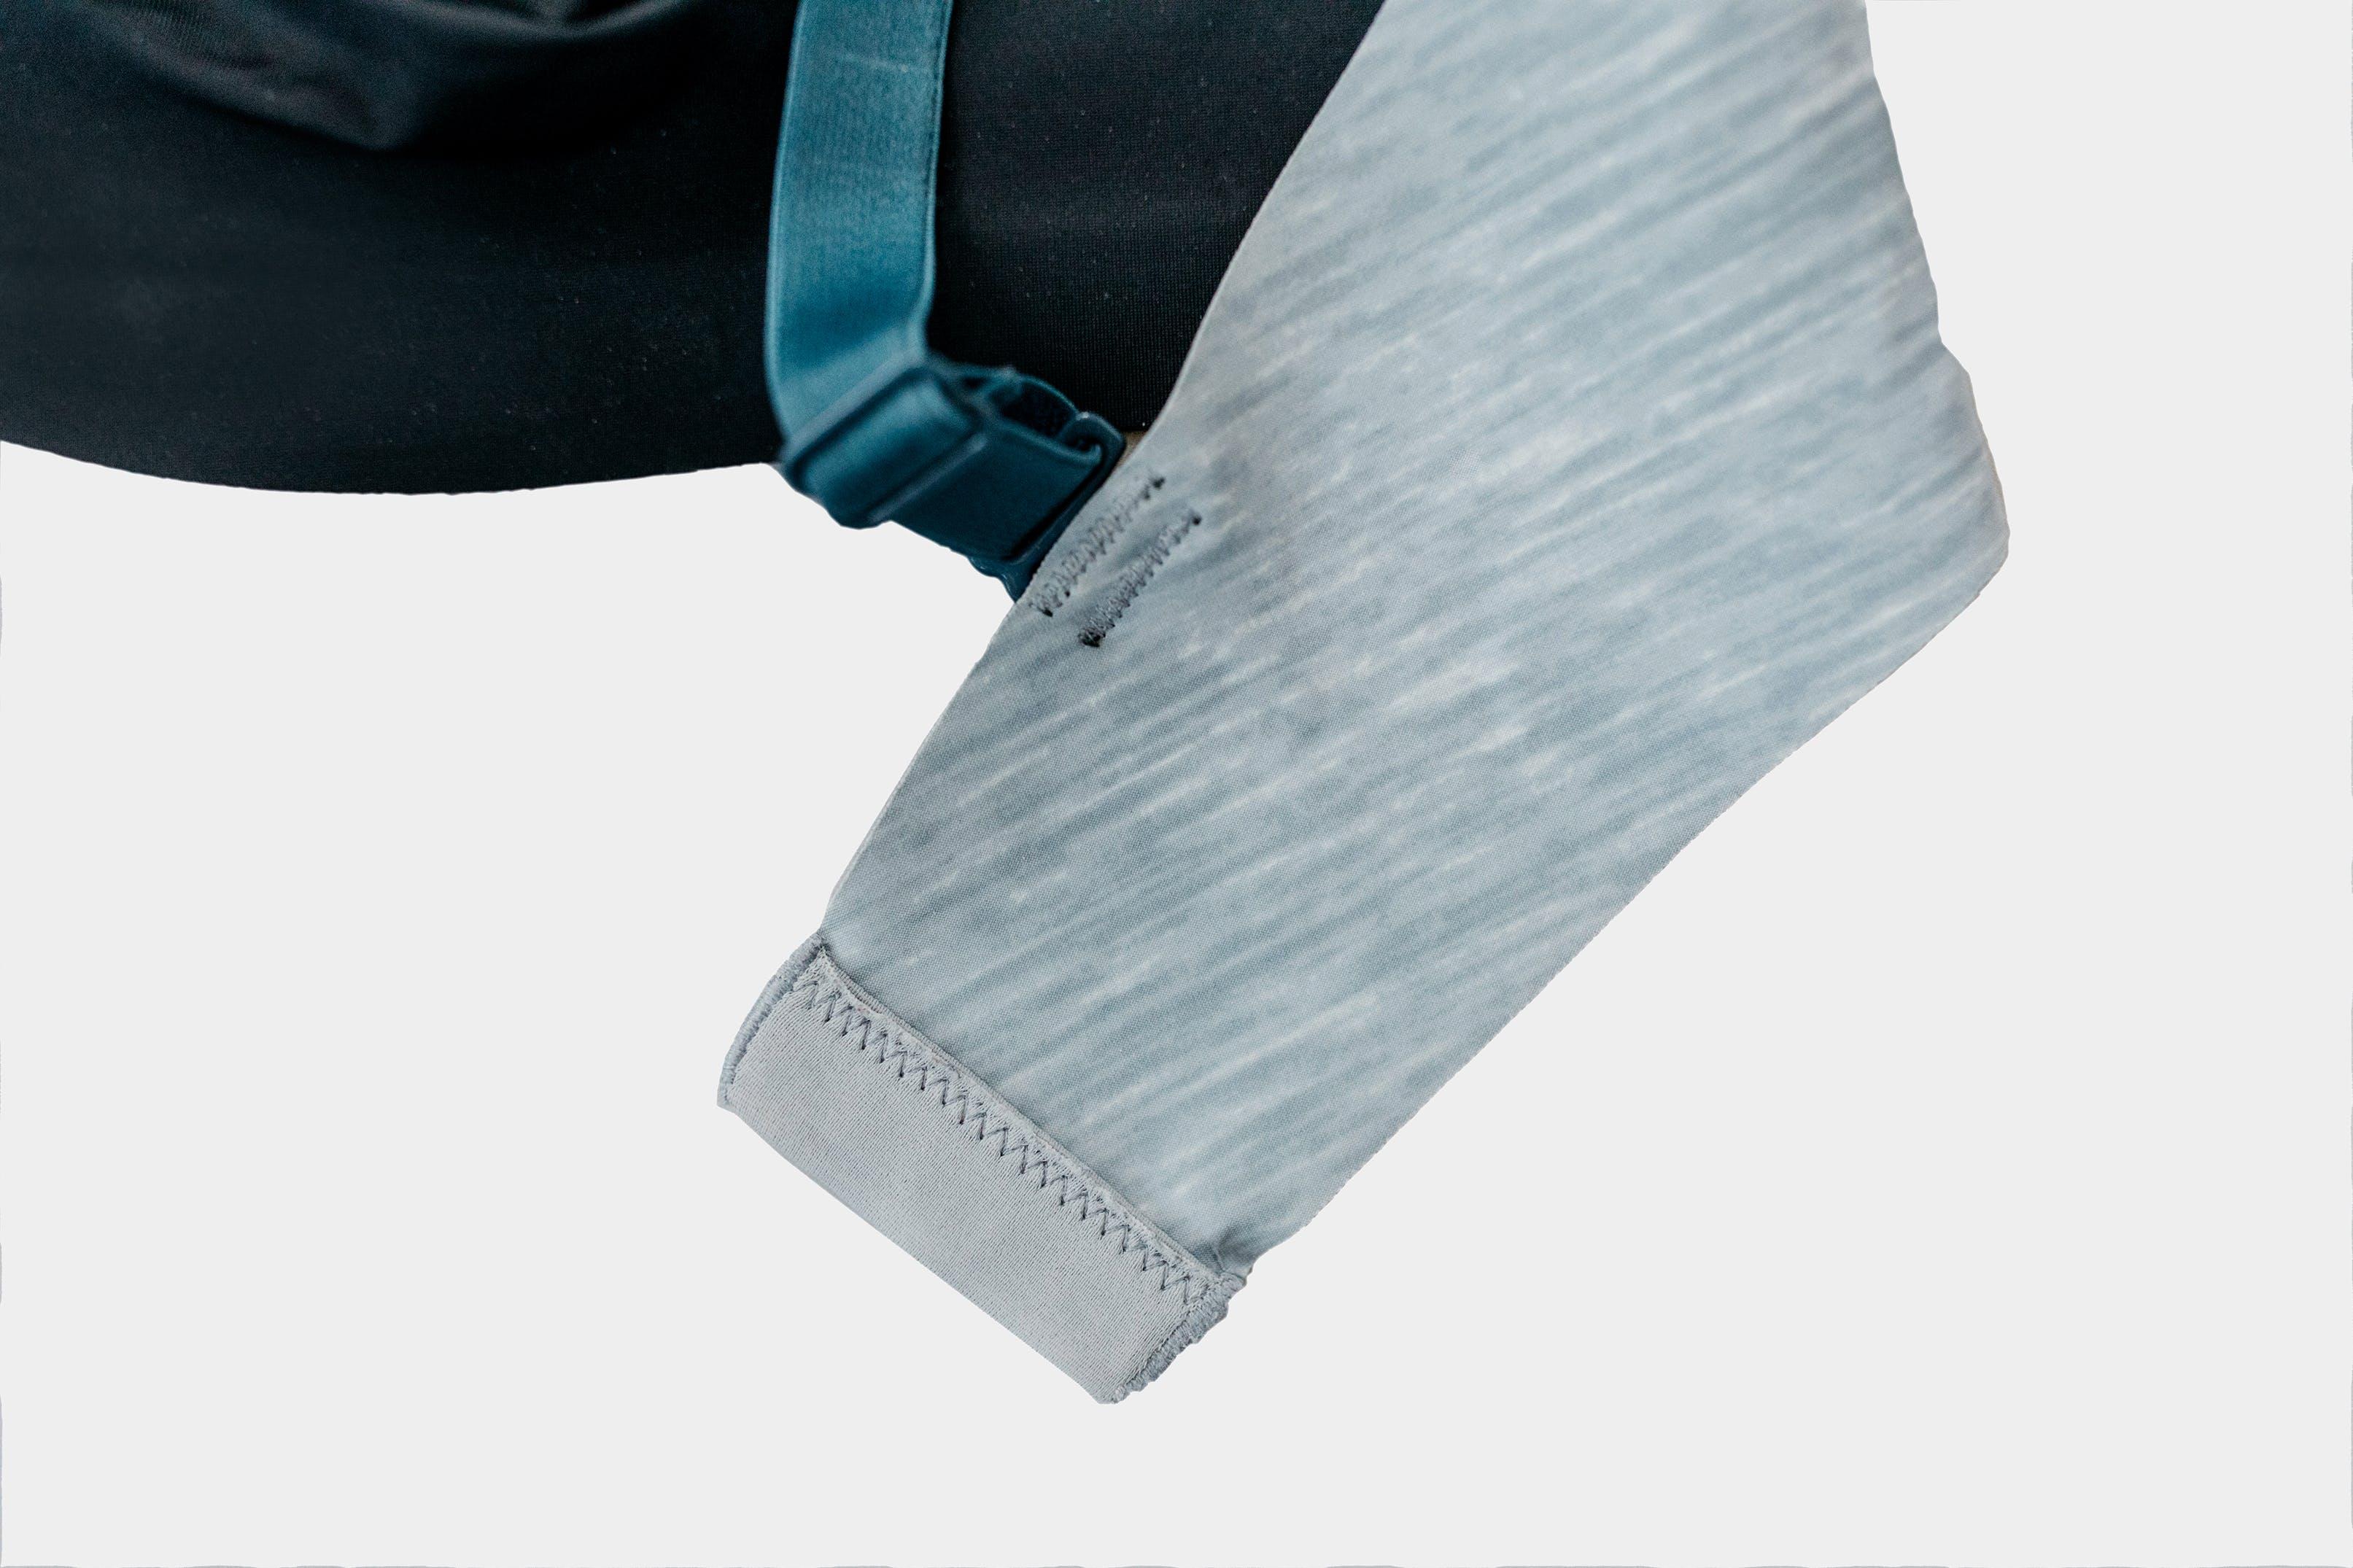 Knix uses nylon and spandex